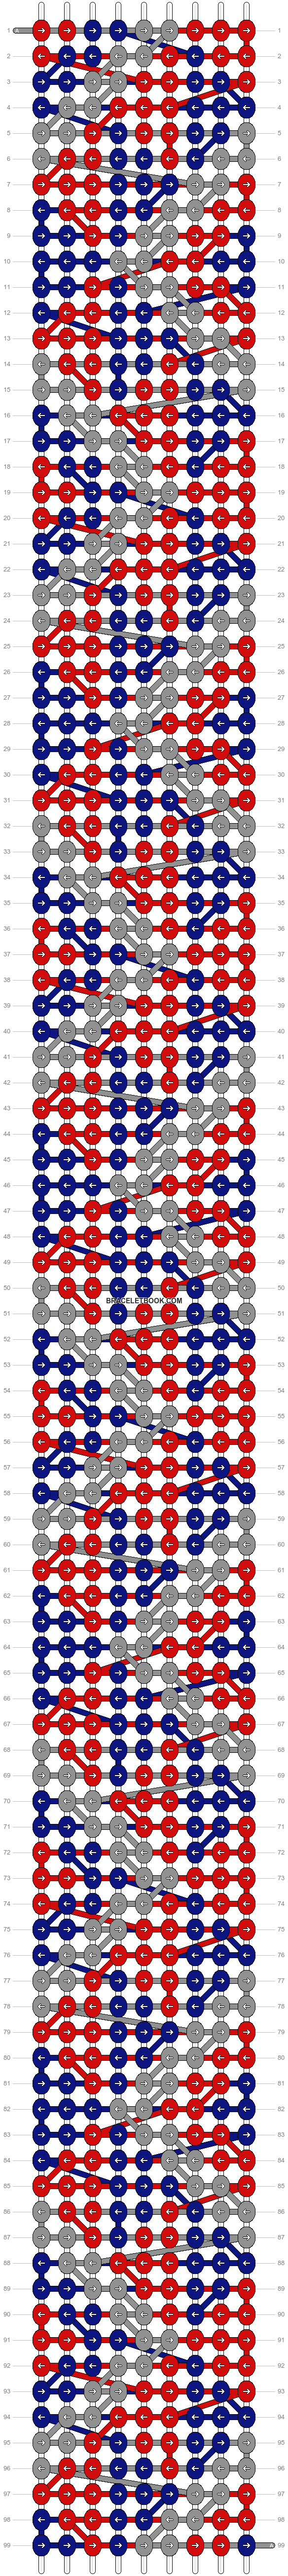 Alpha pattern #11220 pattern